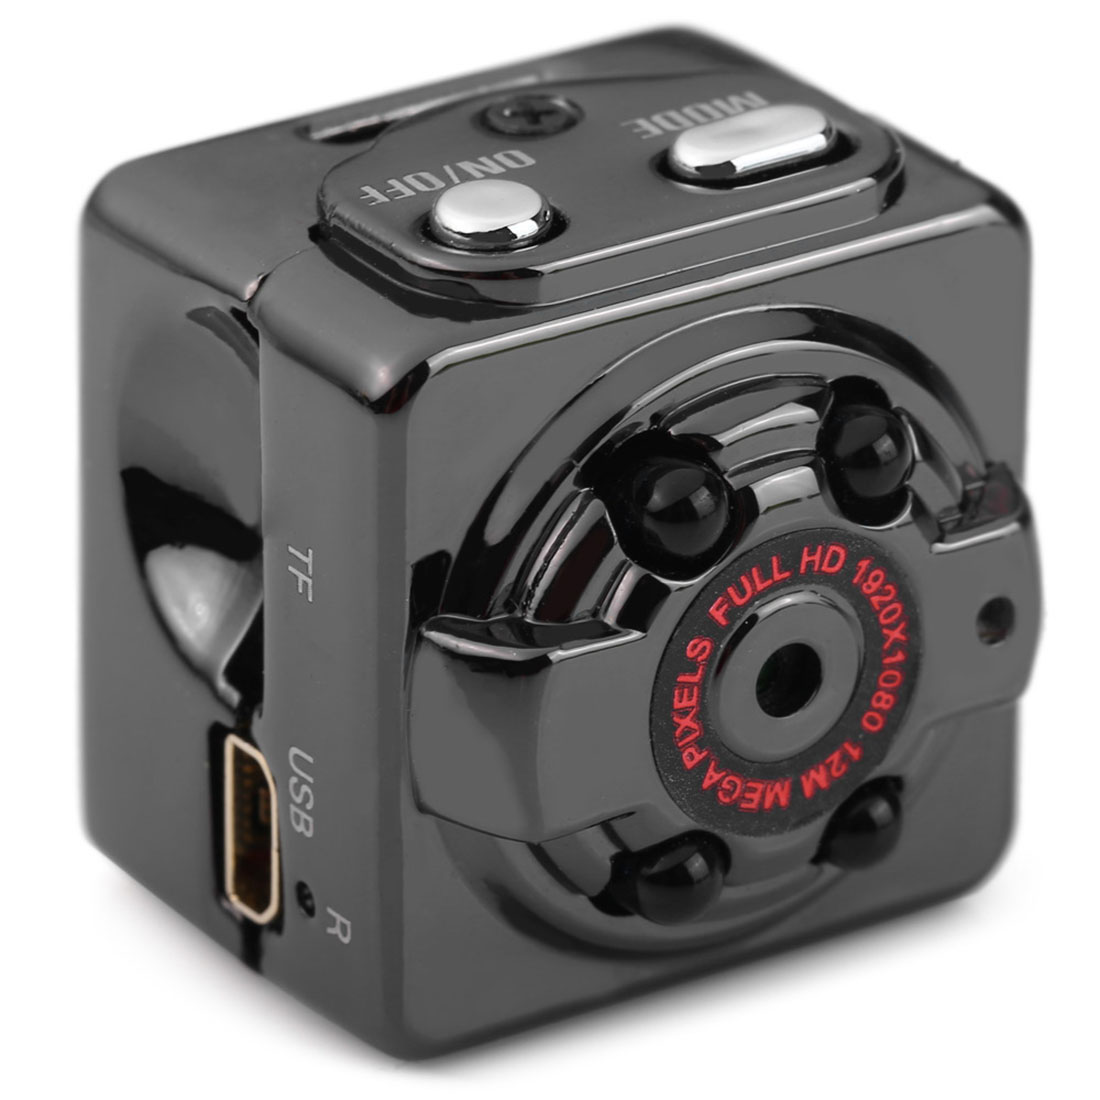 Maiyue star ultra-mini auto DVR 1080P volle HD 10 klasse recorder DV kamera motion detection kamera auto DVR auto kamera